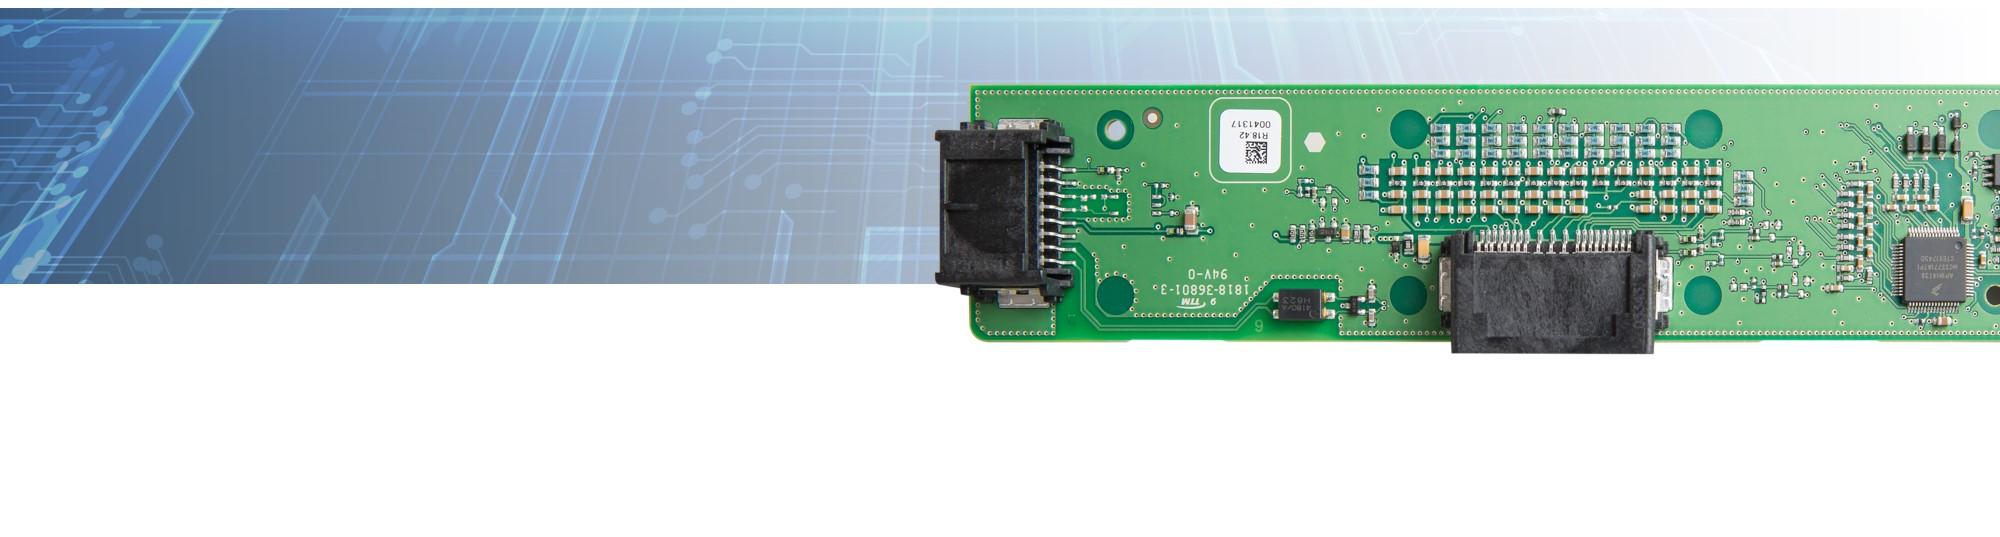 Electronic Circuit Design For Mac